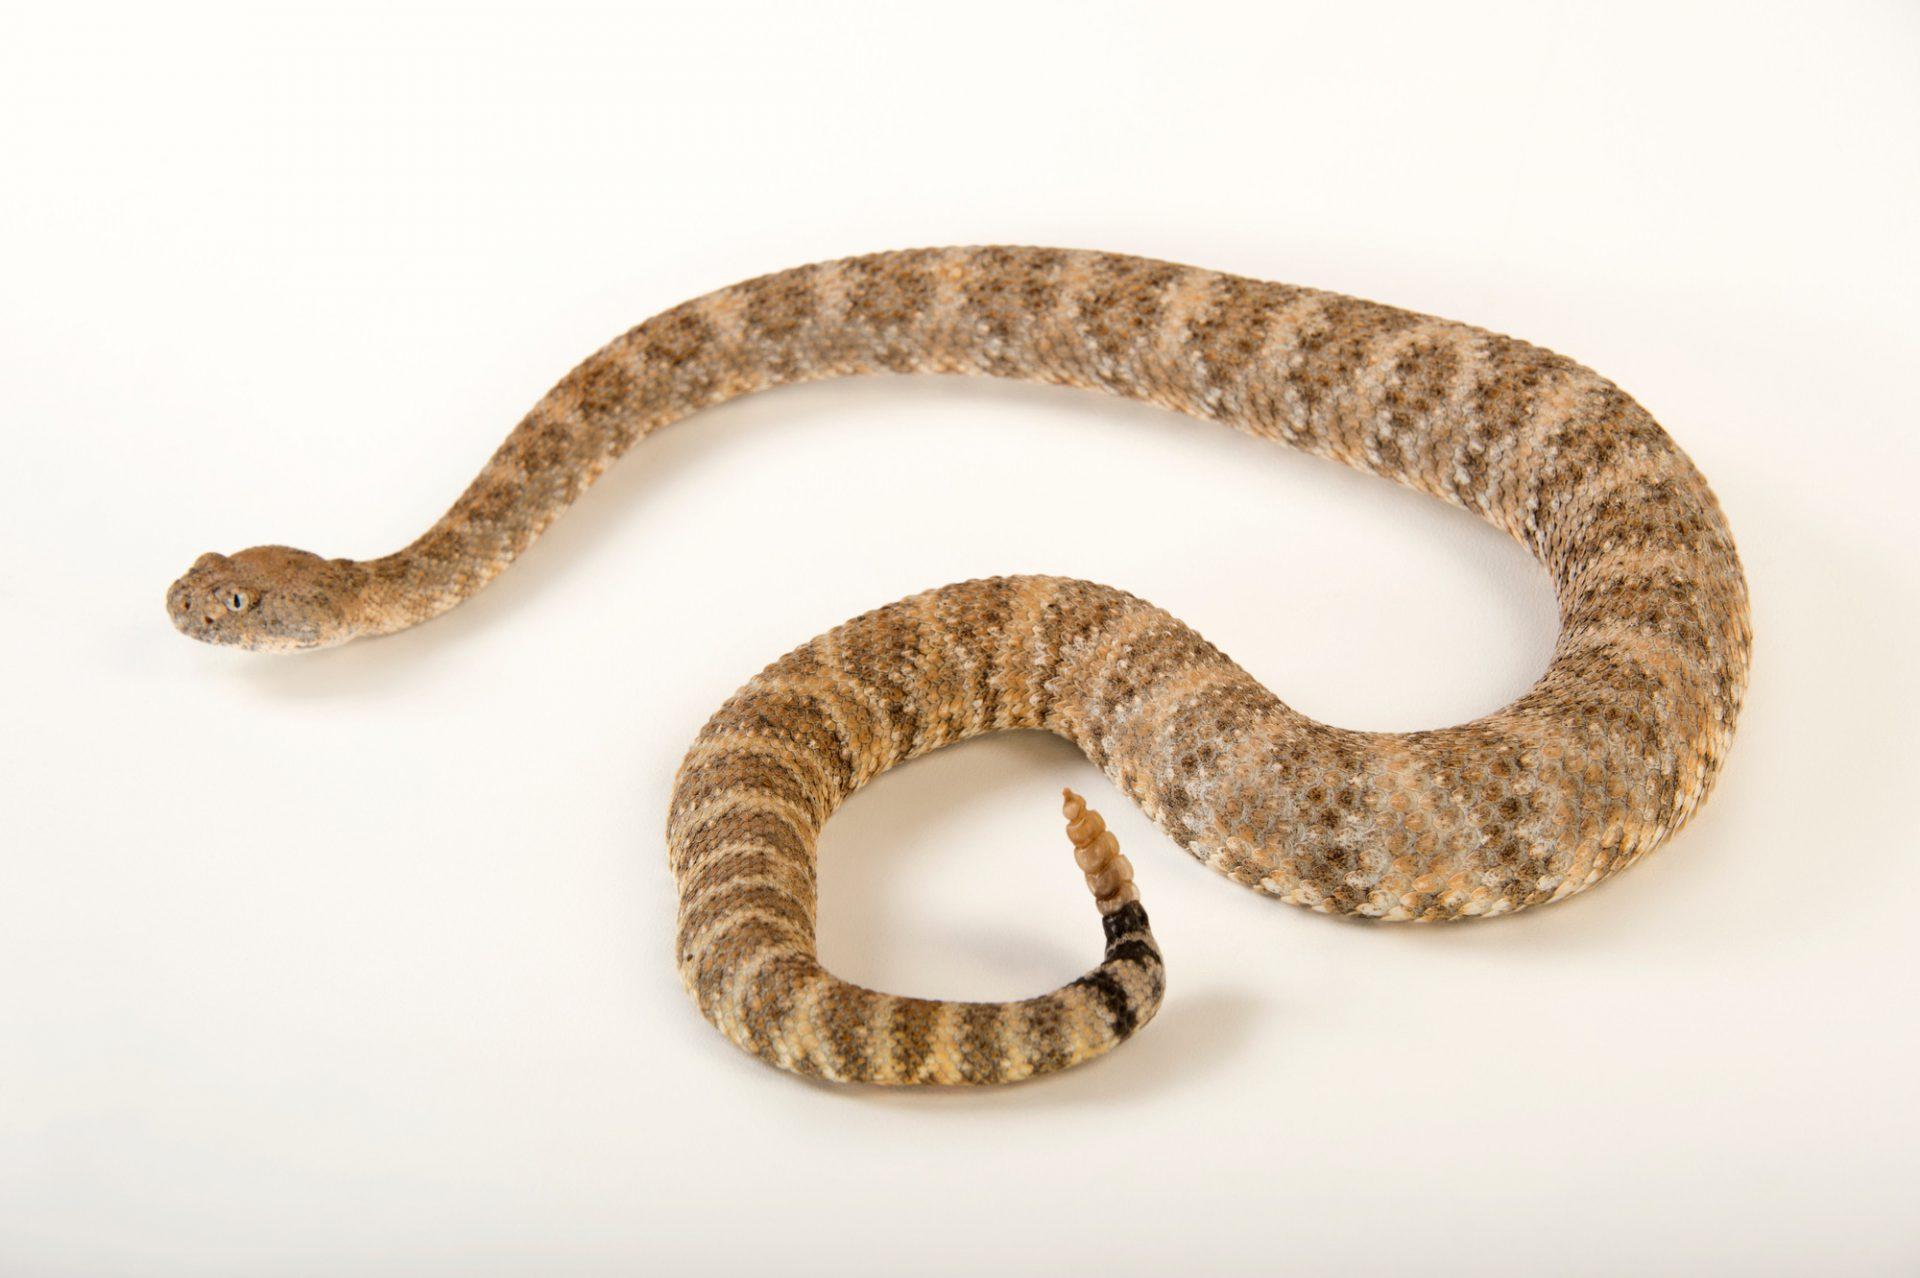 A panamint rattlesnake (Crotalus mitchellii stephensi) at The Living Desert in Palm Desert, California.